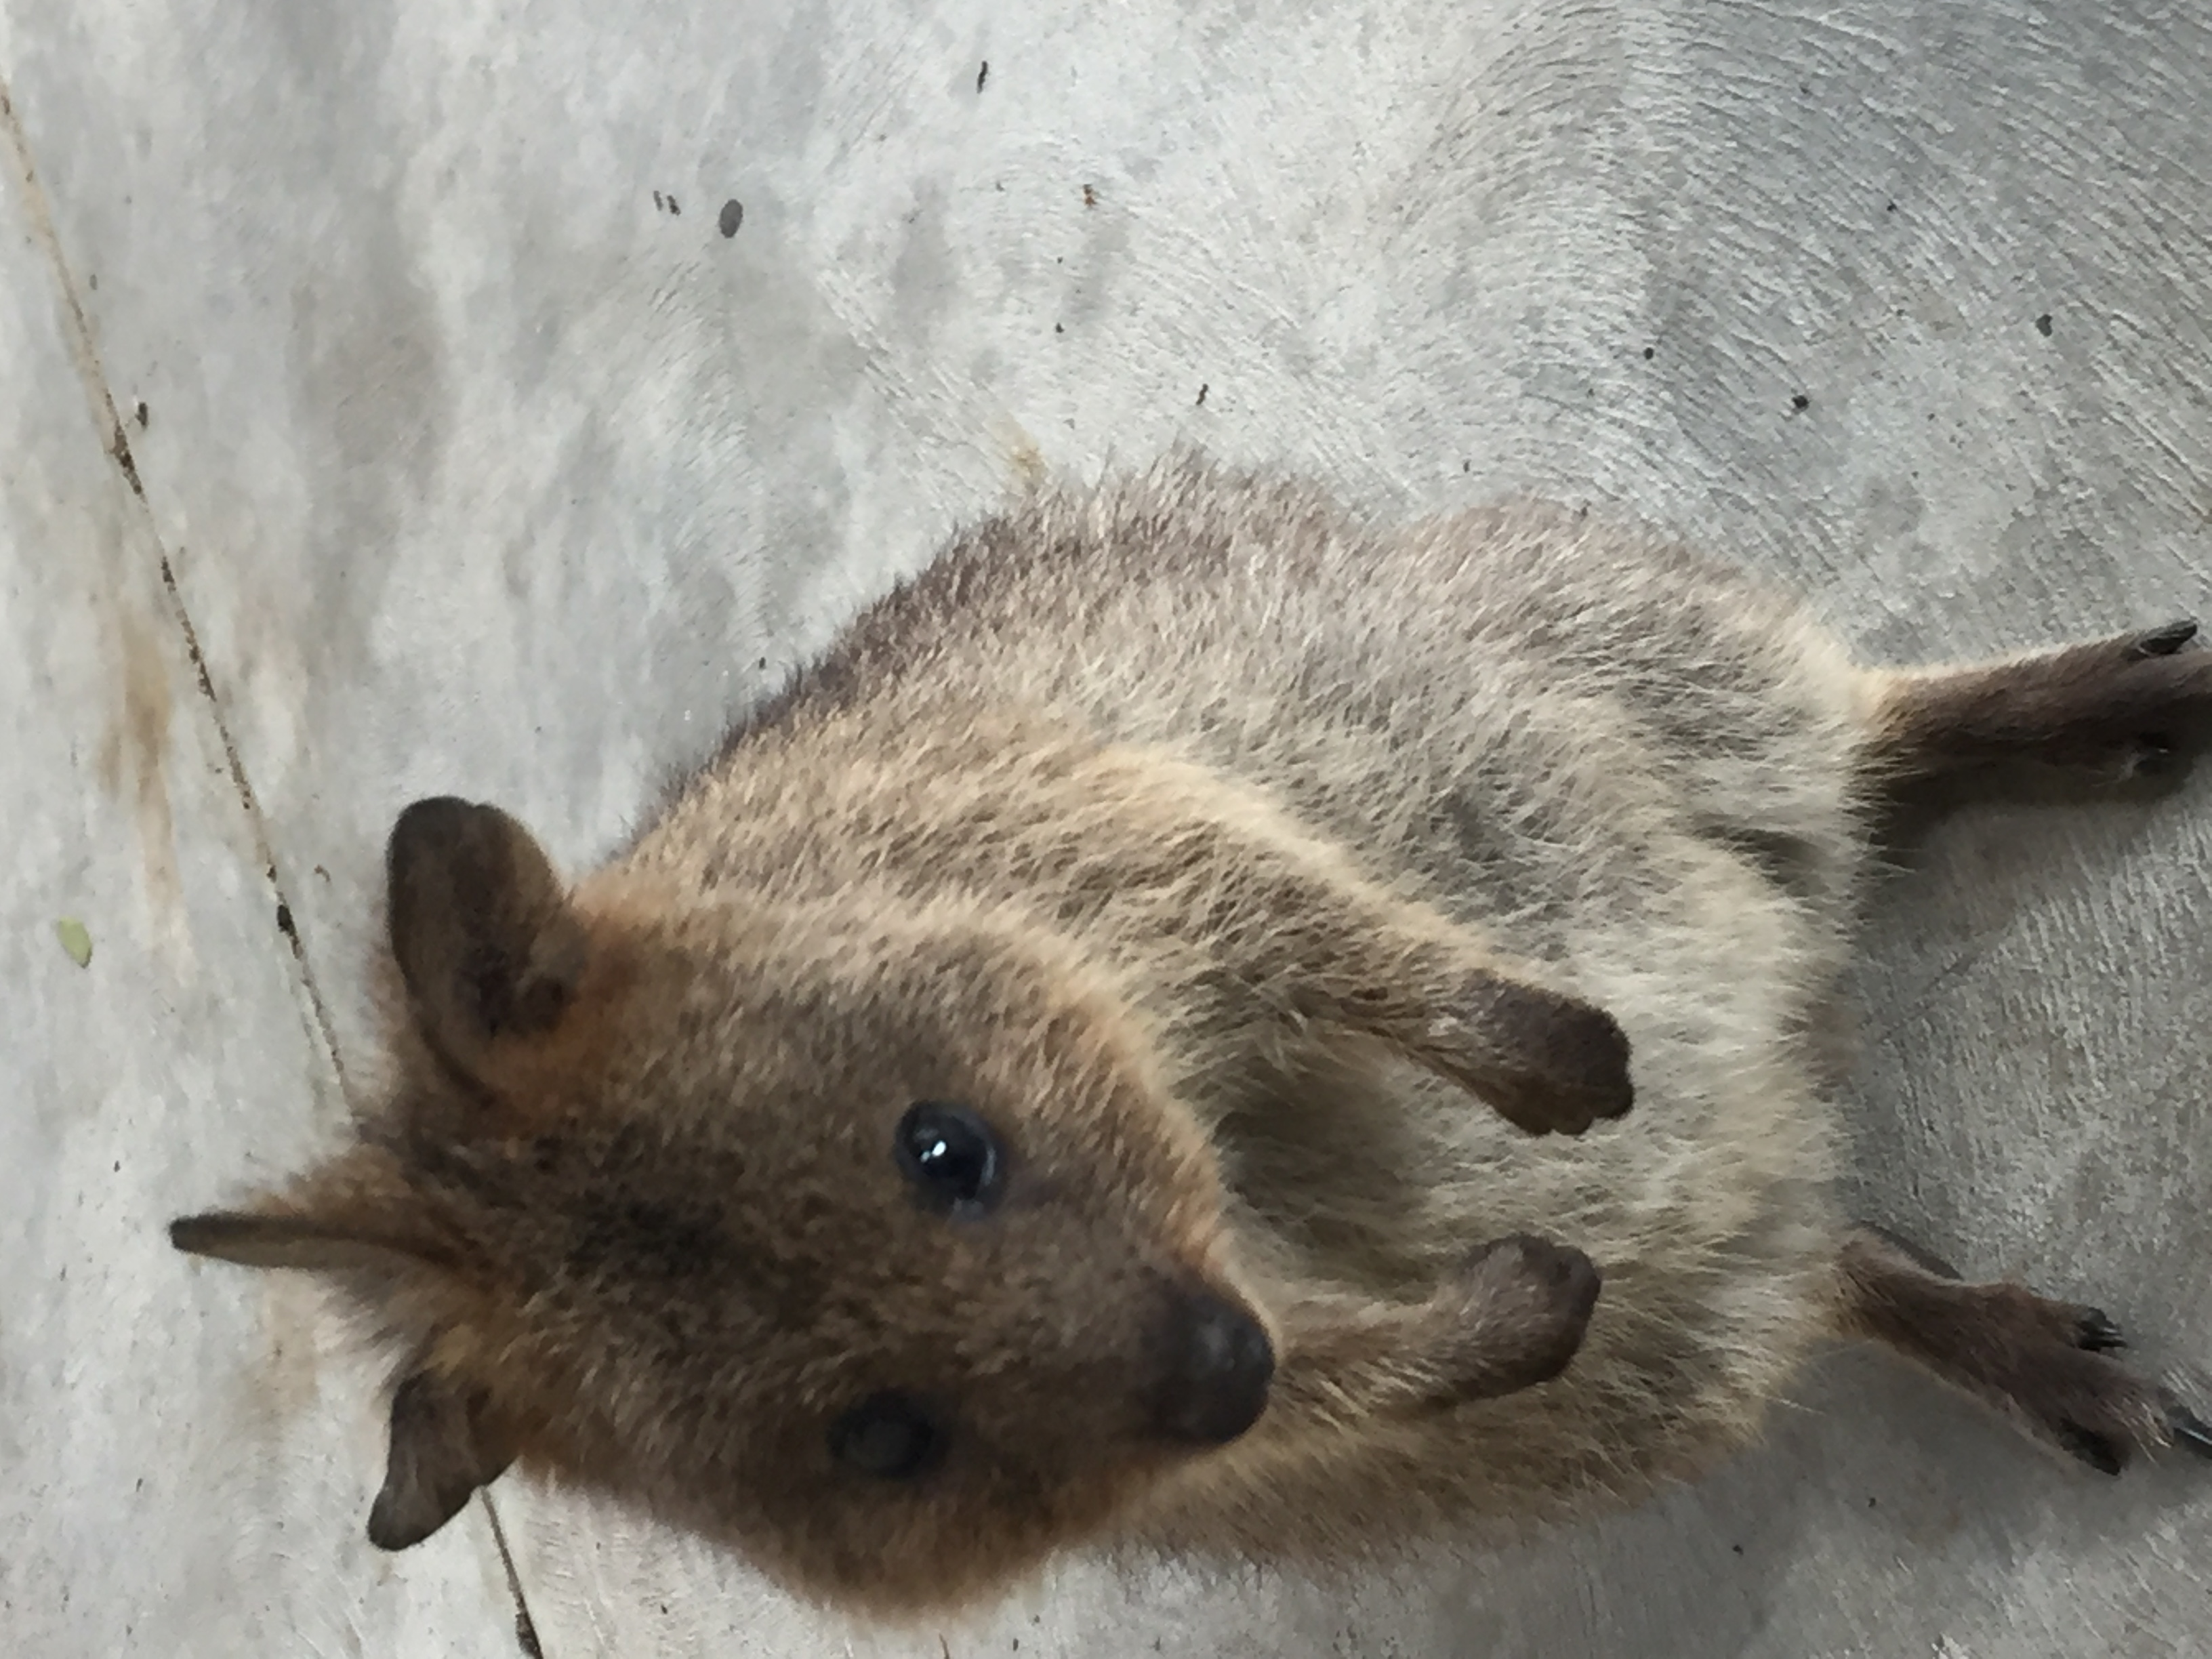 File:Three-eared quokka.jpg - Wikimedia Commons